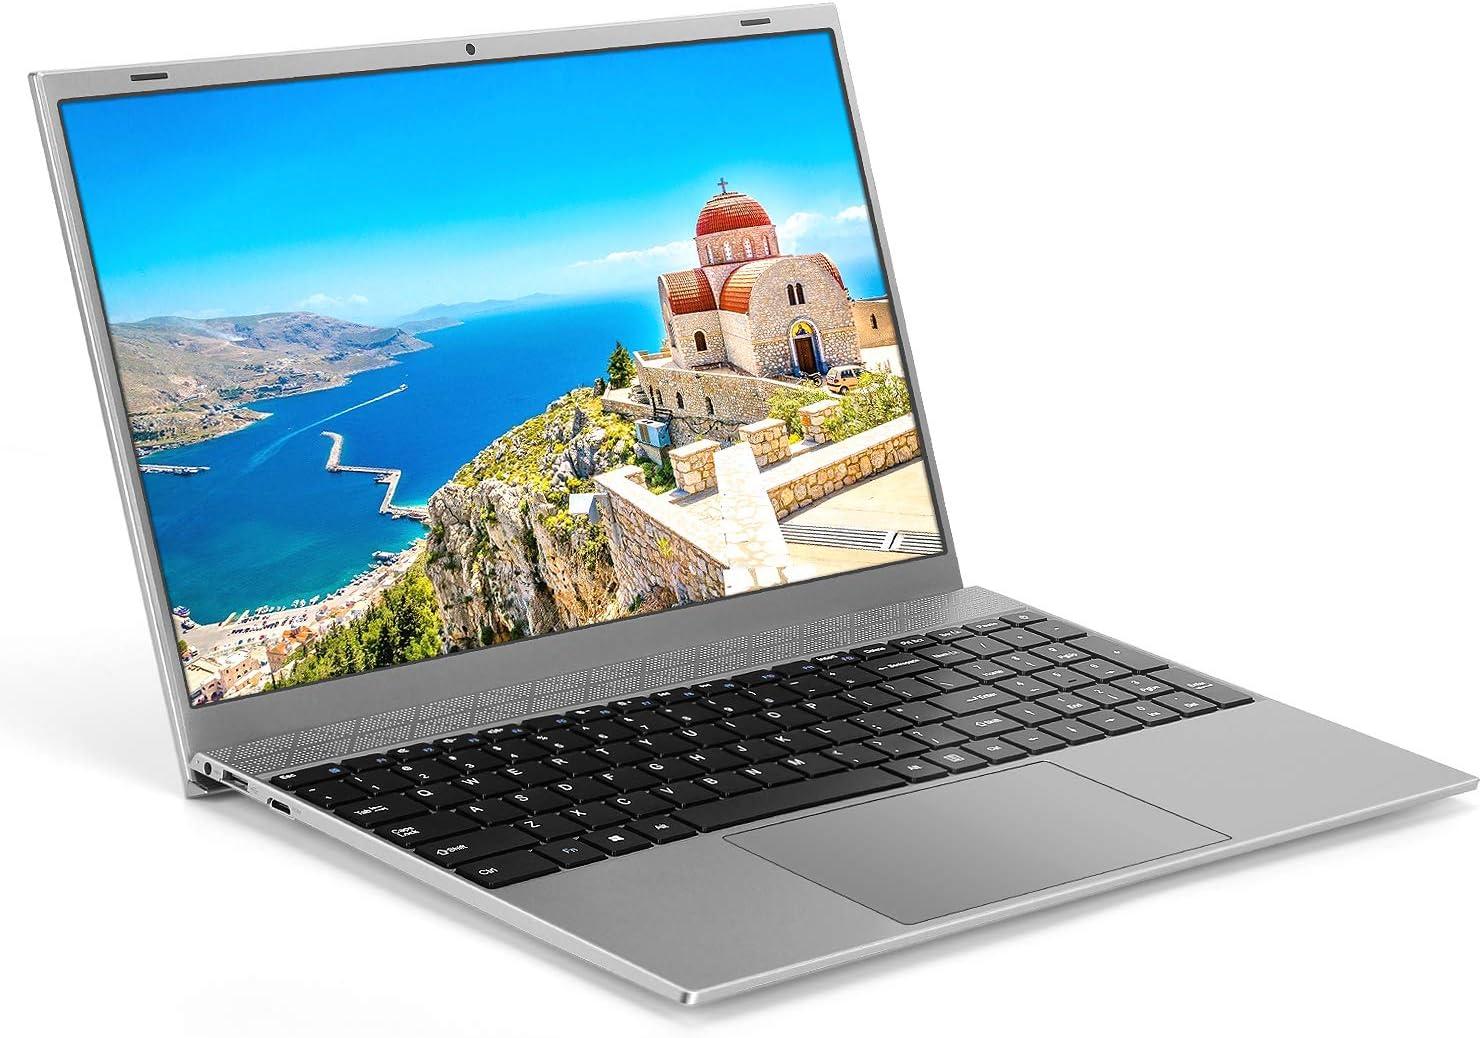 Laptop 15.6 inch Notebook Computer 8GB RAM 128GB SSD Intel Quad Core Full HD Display with WiFi Mini HDMI YELLYOUTH Windows 10 Laptop Grey